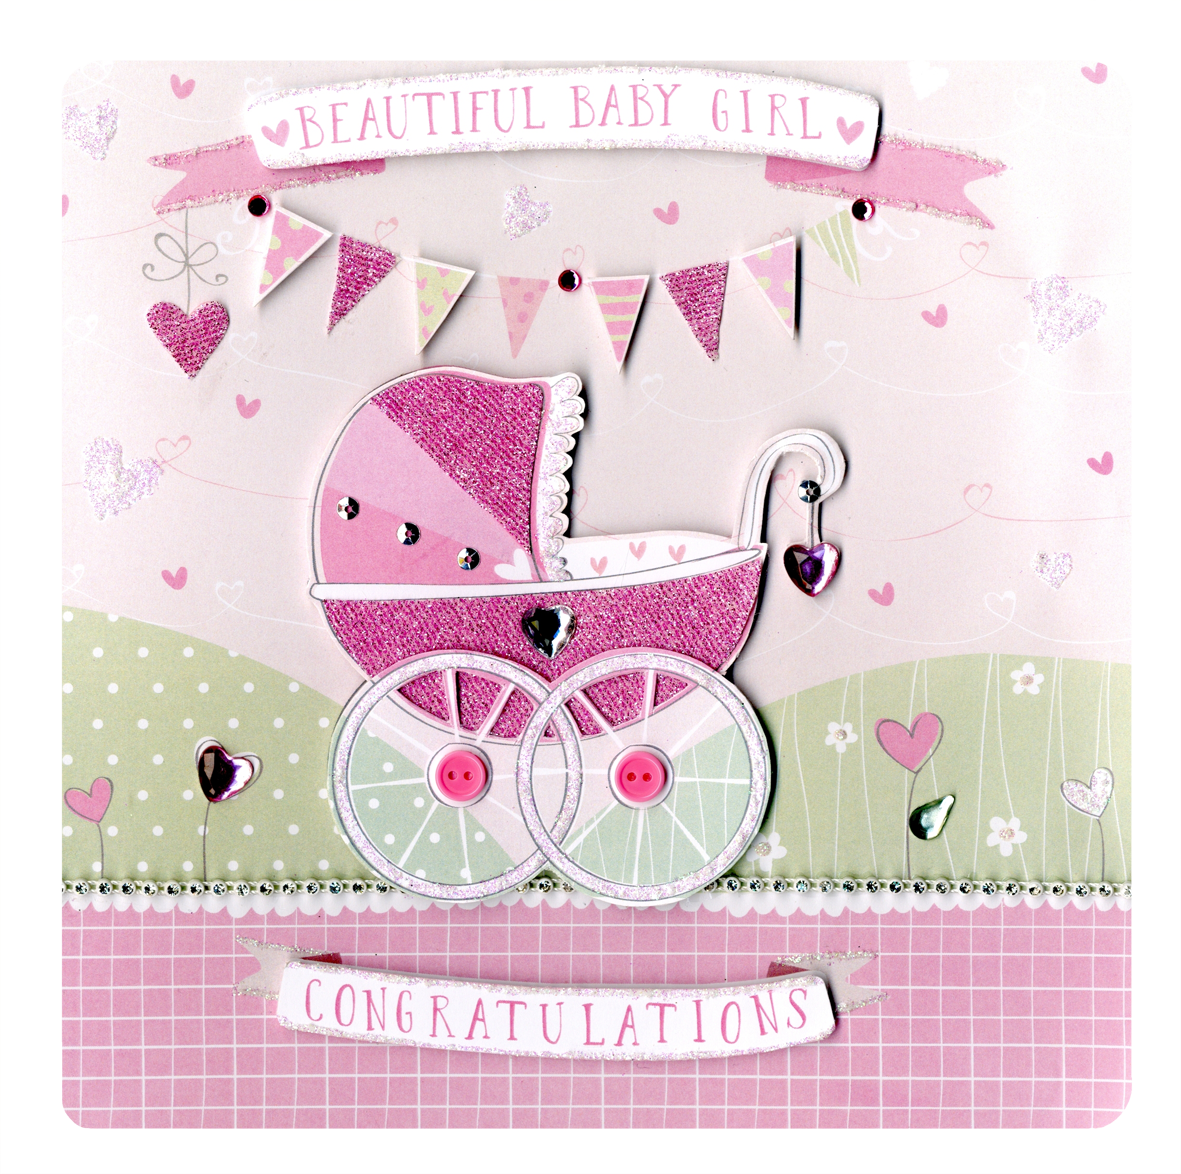 Beautiful New Baby Girl Keepsake Card  Cards  Love Kates-2681